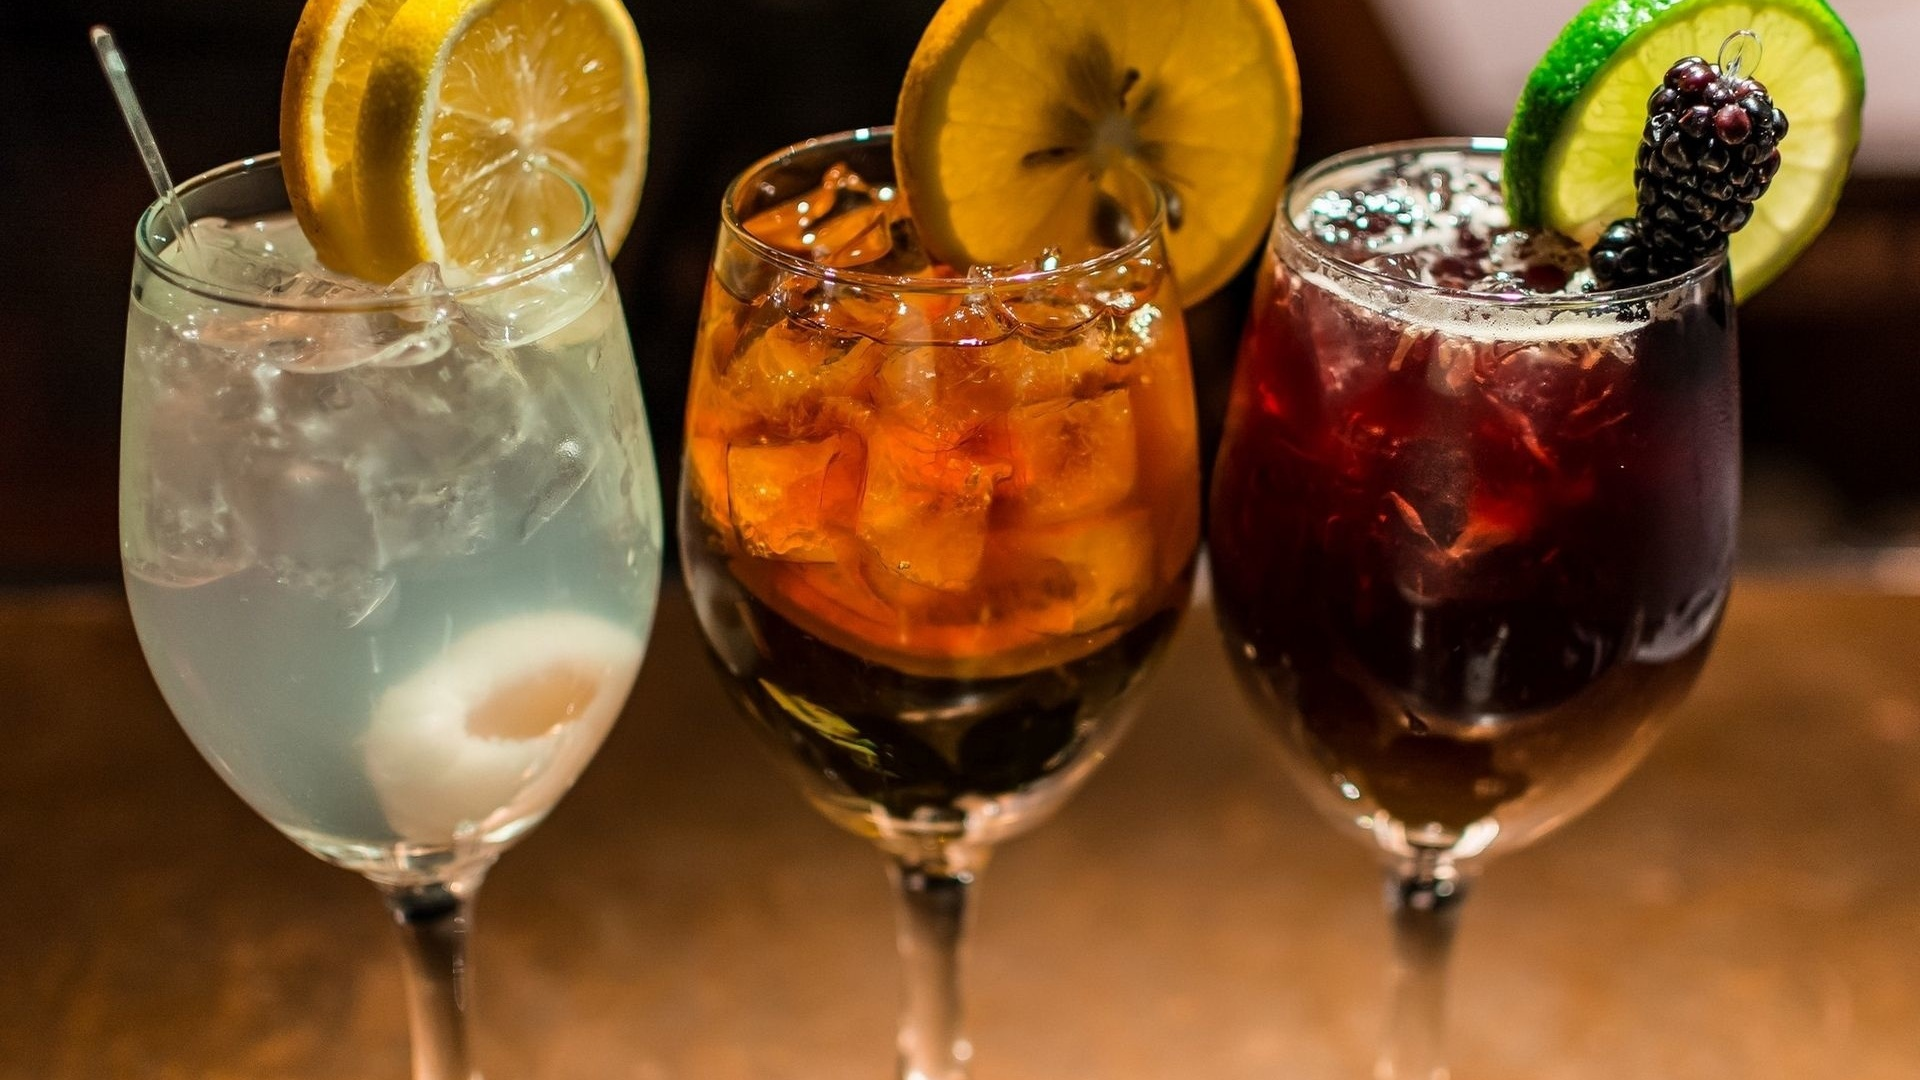 картинки с напитками ребенка слой меньше